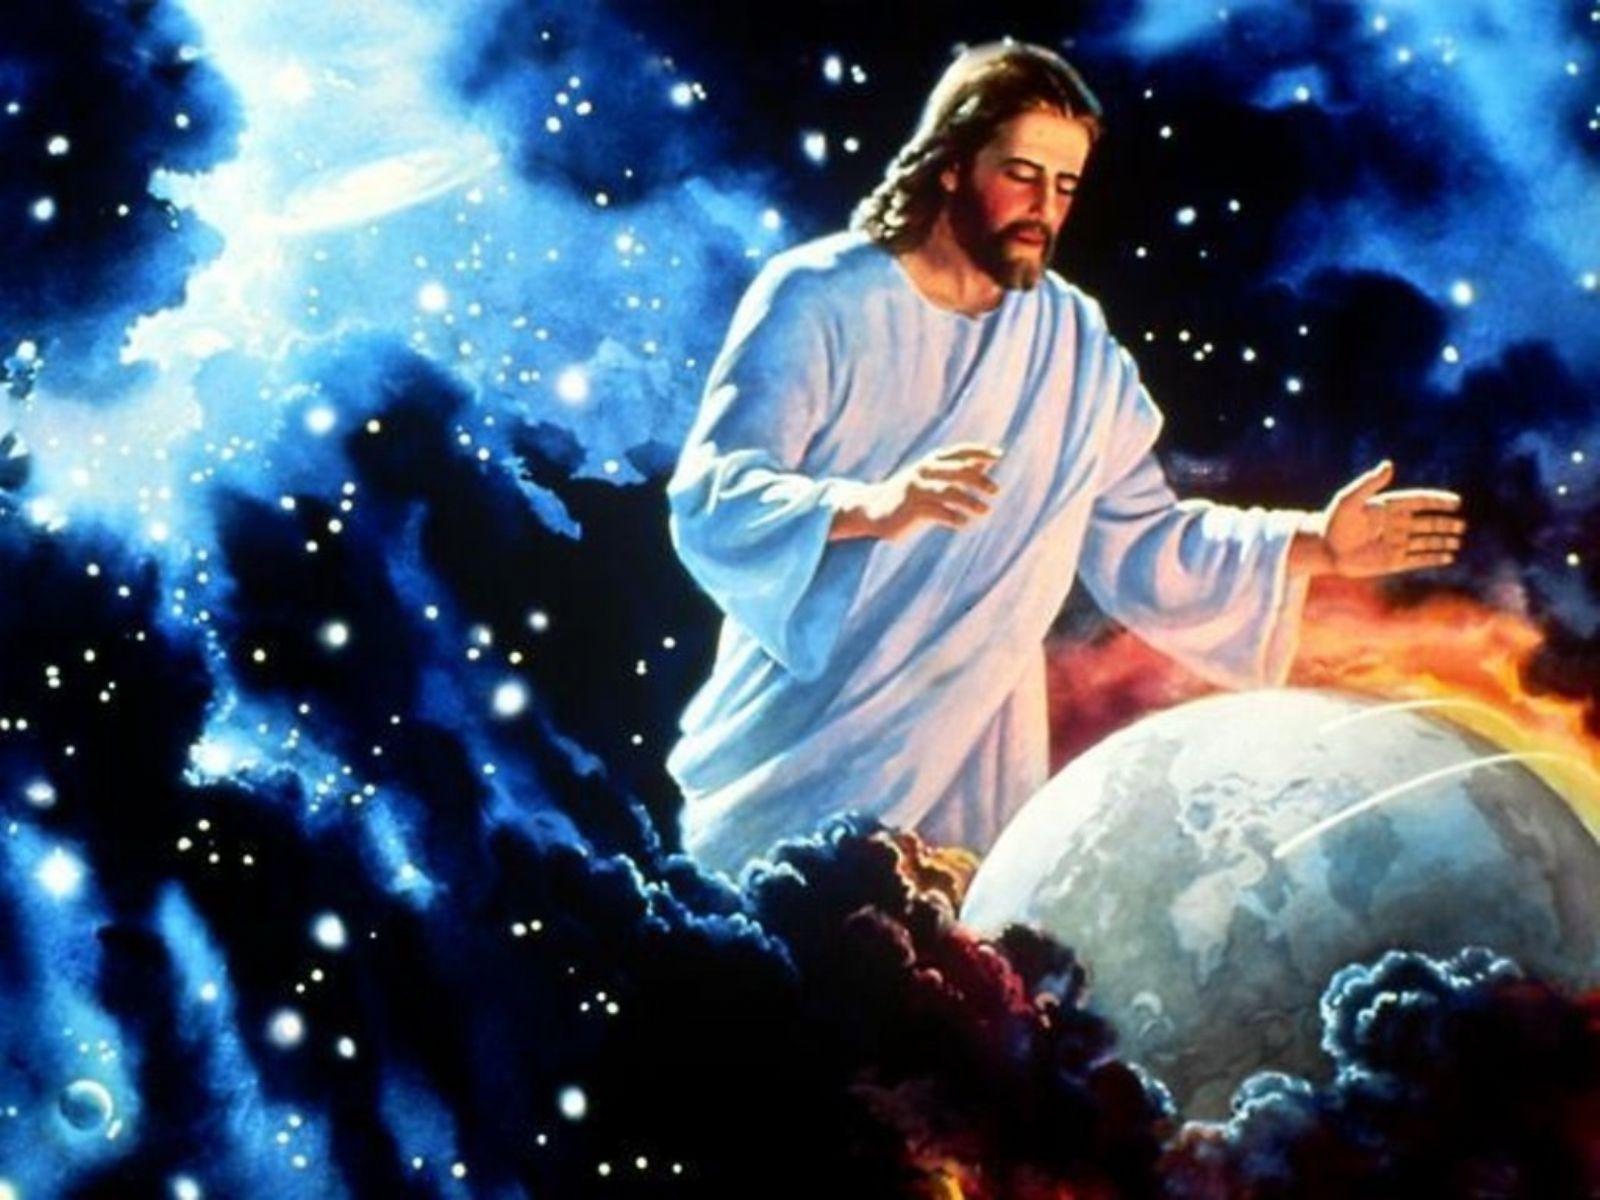 http://2.bp.blogspot.com/-6y4ep_CzK94/TleihkIGcuI/AAAAAAAAAFM/W4AlyHl9Q80/s1600/Jesus-Wallpapers-6.jpg